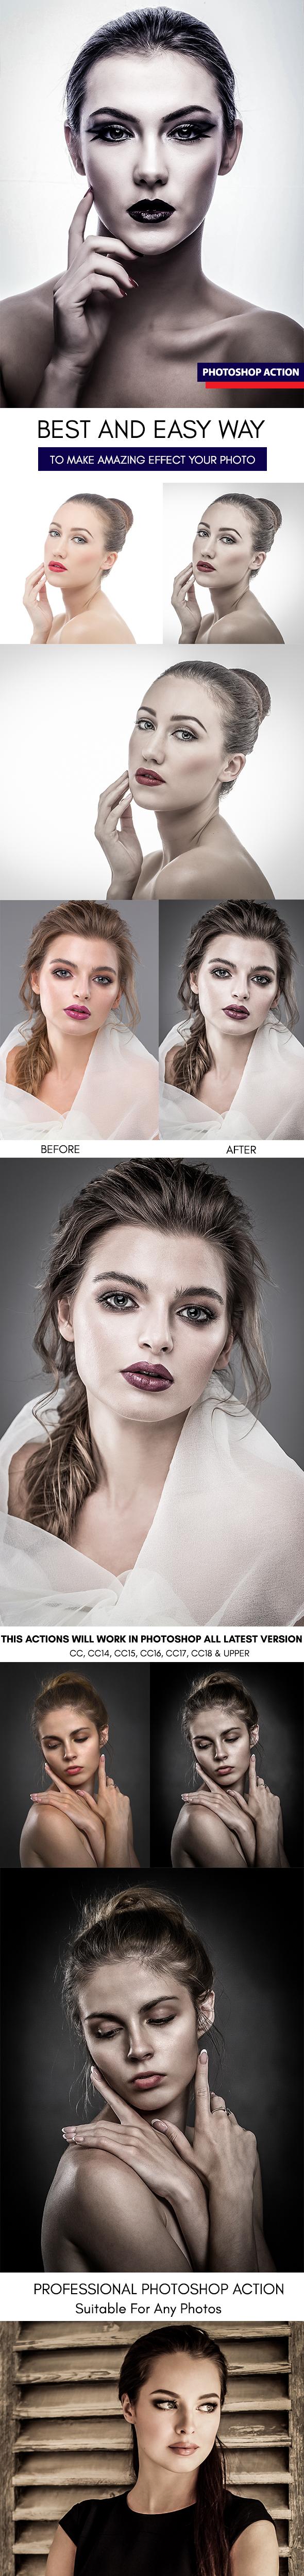 Dramatic Portrait :: Photoshop Action - Photoshop Add-ons